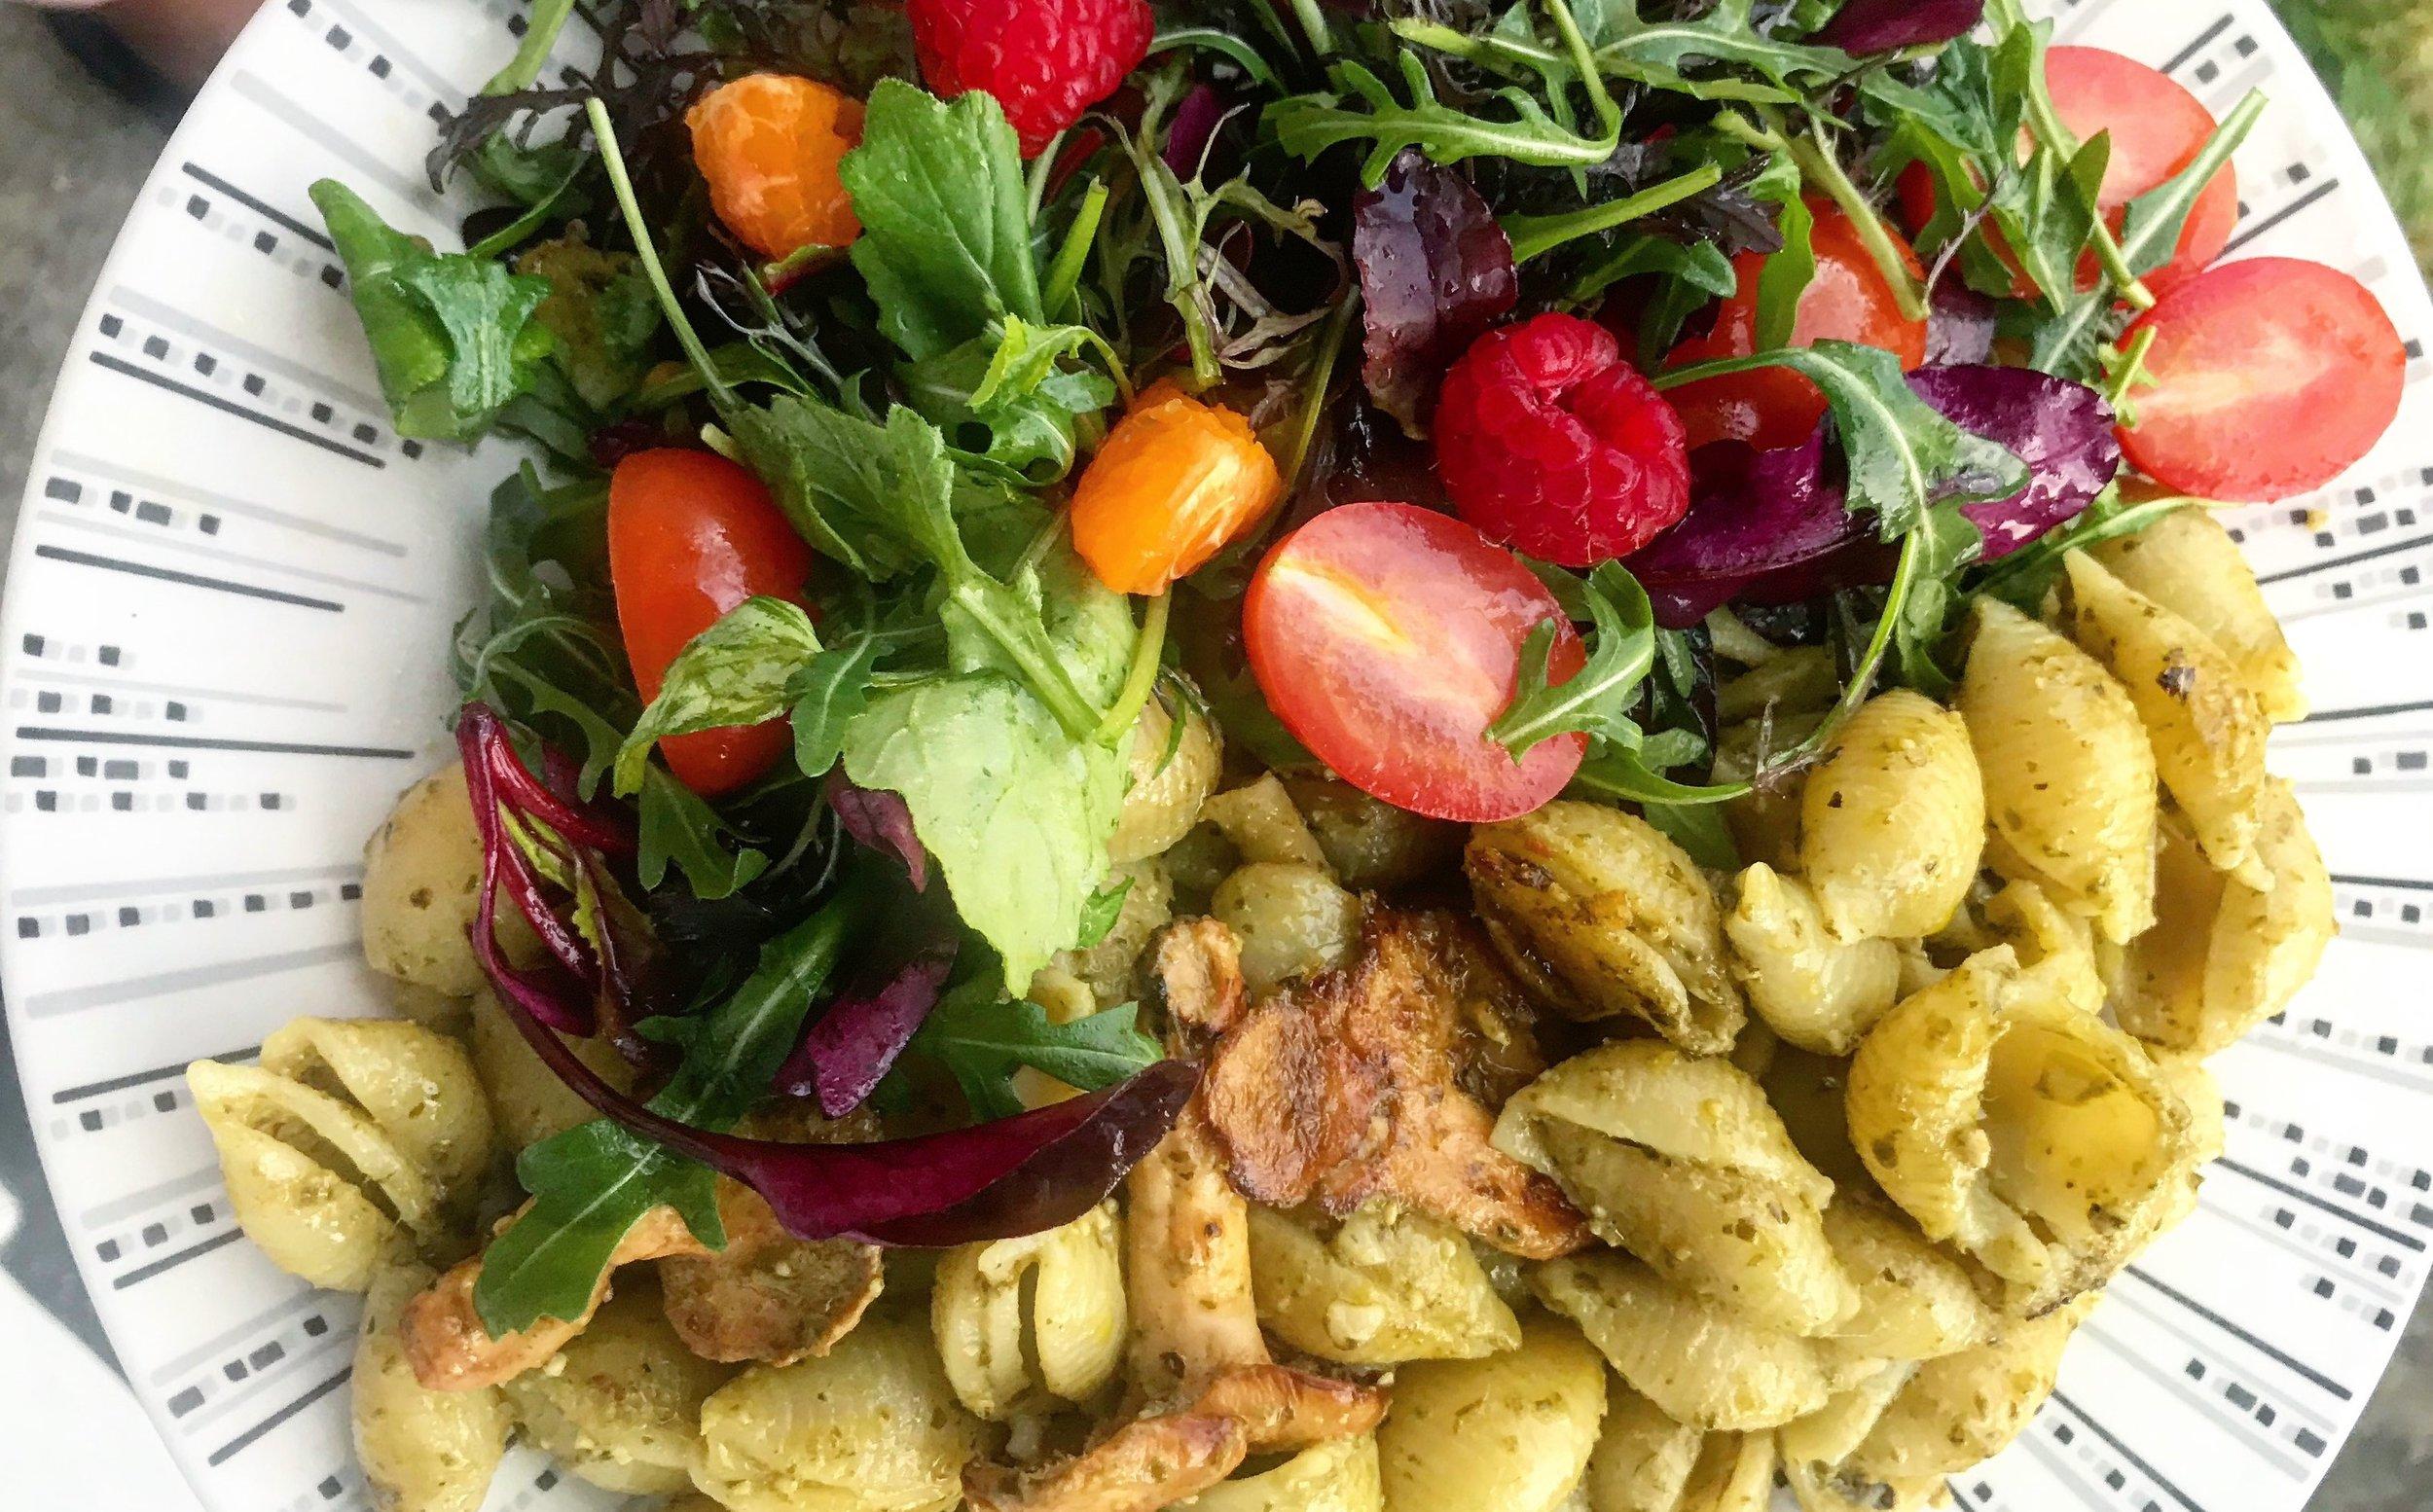 Salad & earthy aroma Maitako mushroom, pasta with spicy pesto. Very tasty treat! Mushrooms are great for you. They have many health benefits.